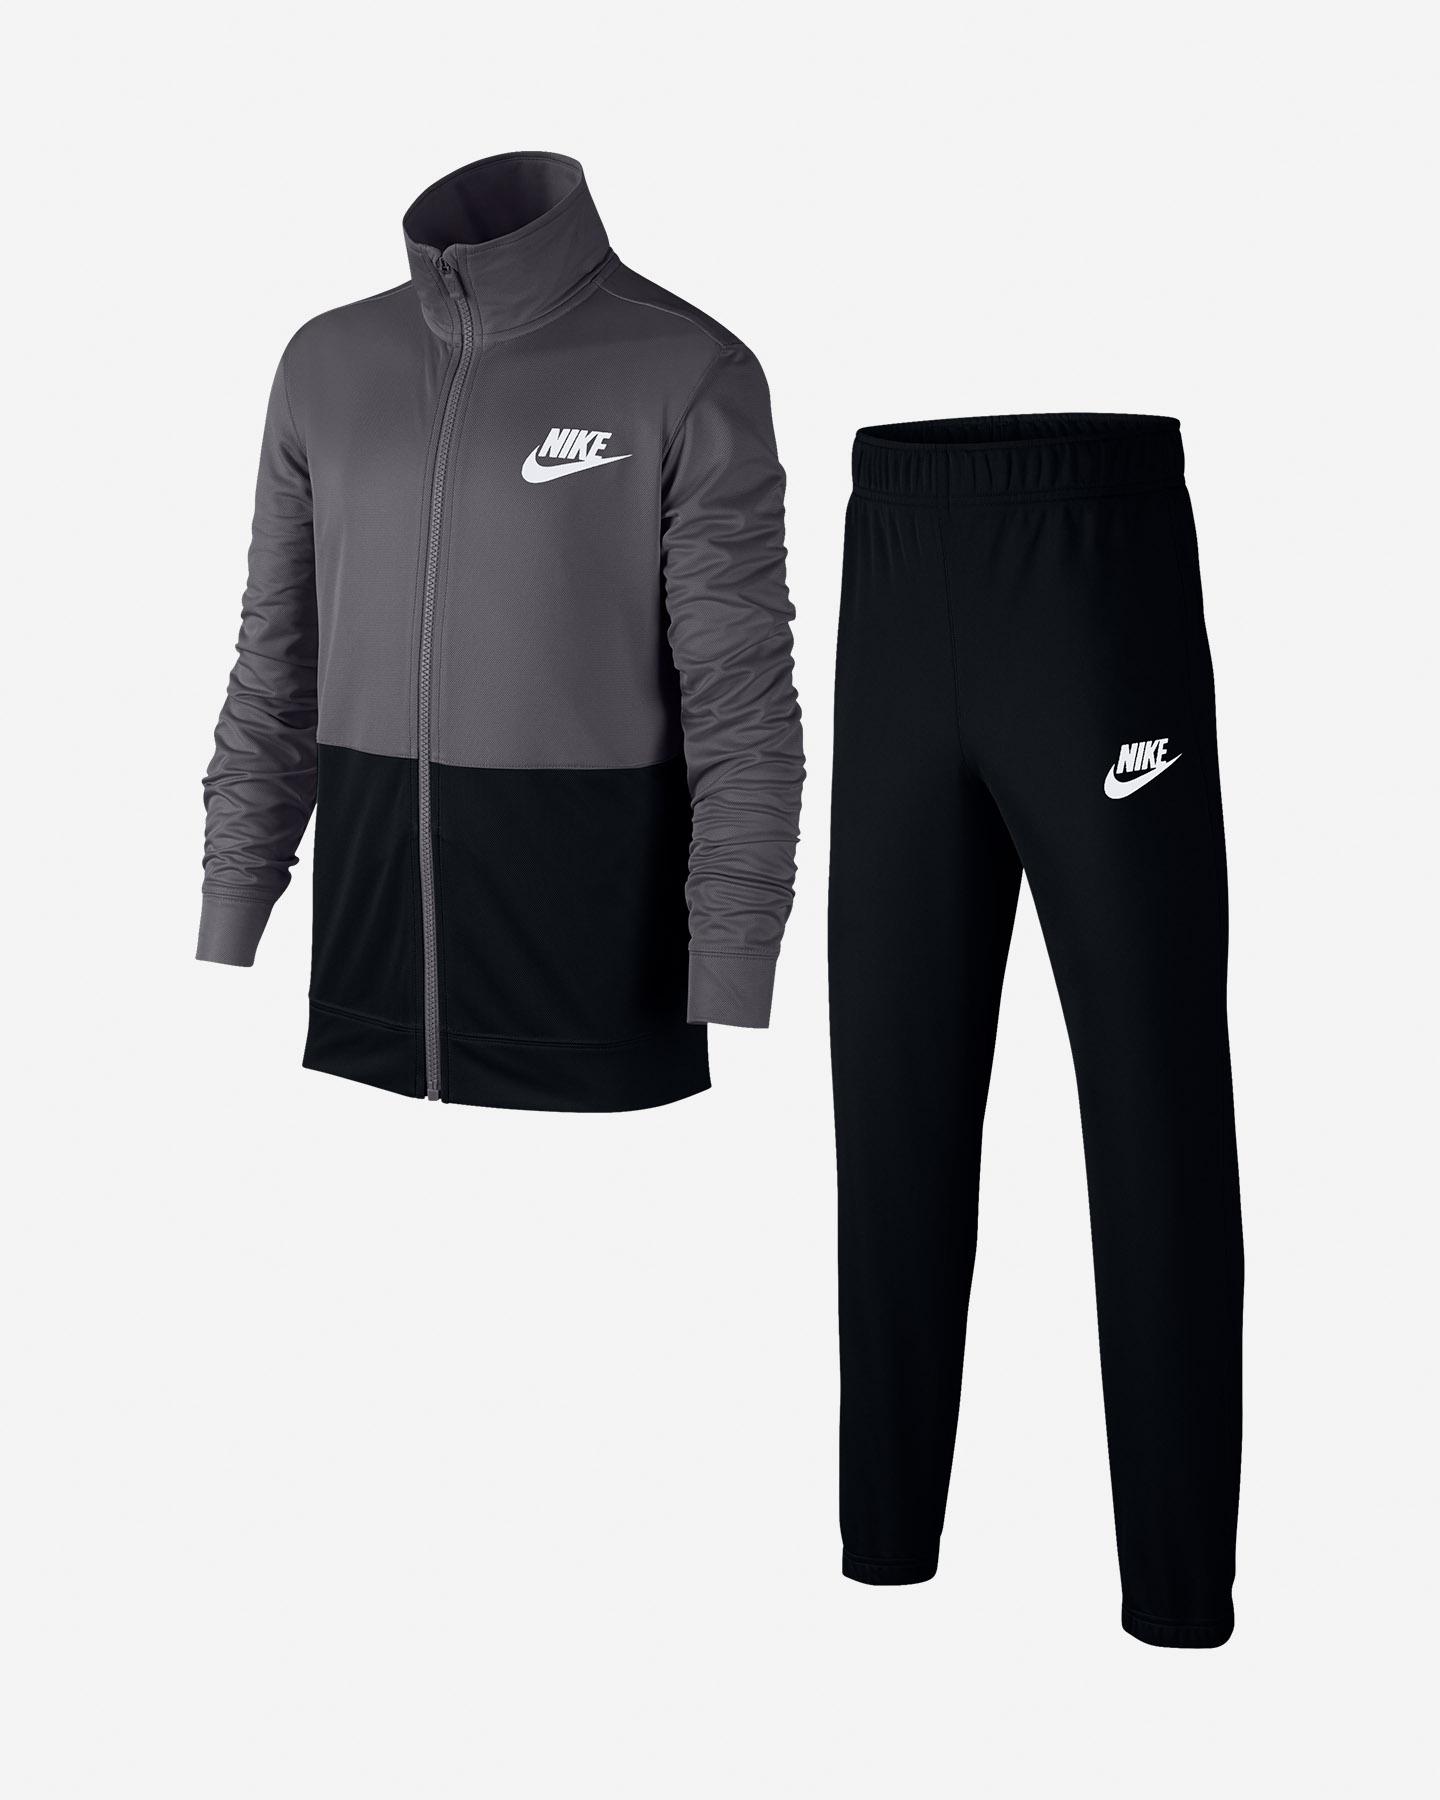 Scarpe Nike Zalando Scarpe Uomo Zalando Saldi b76yYgf